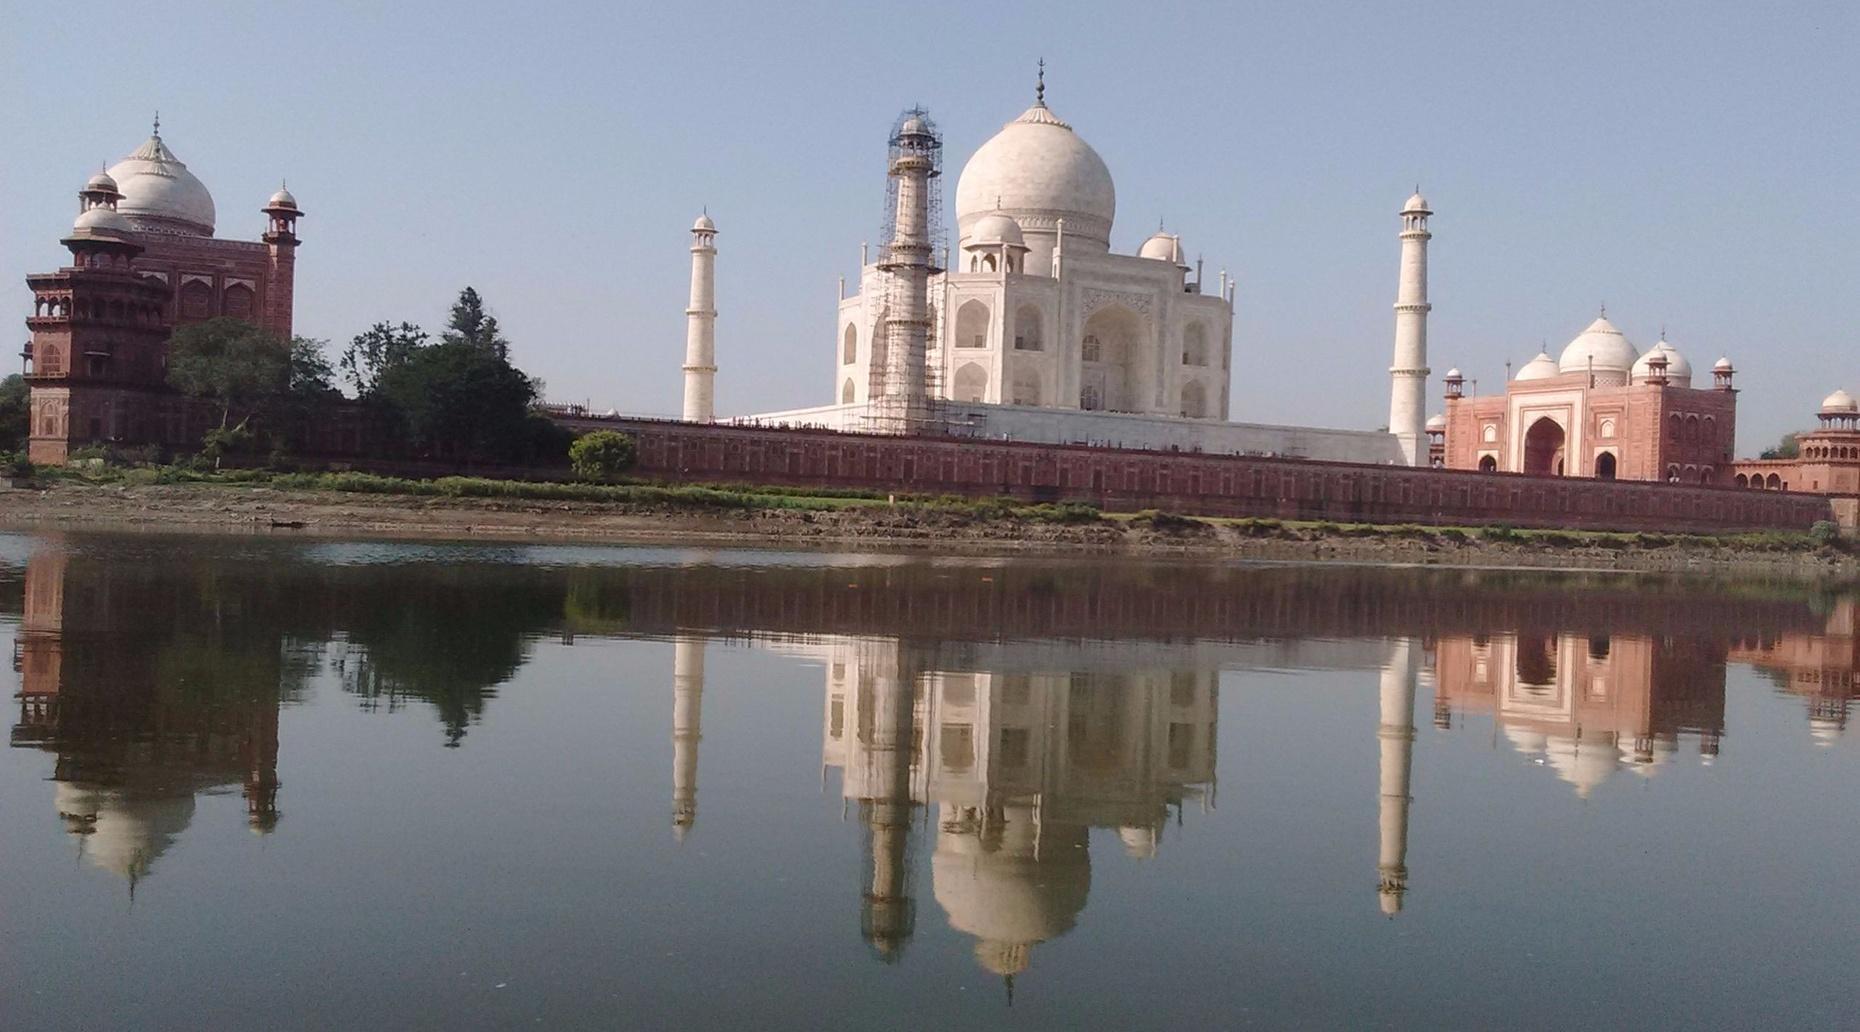 Full-Day Taj Mahal Tour With Gatimaan Express Ride From Delhi